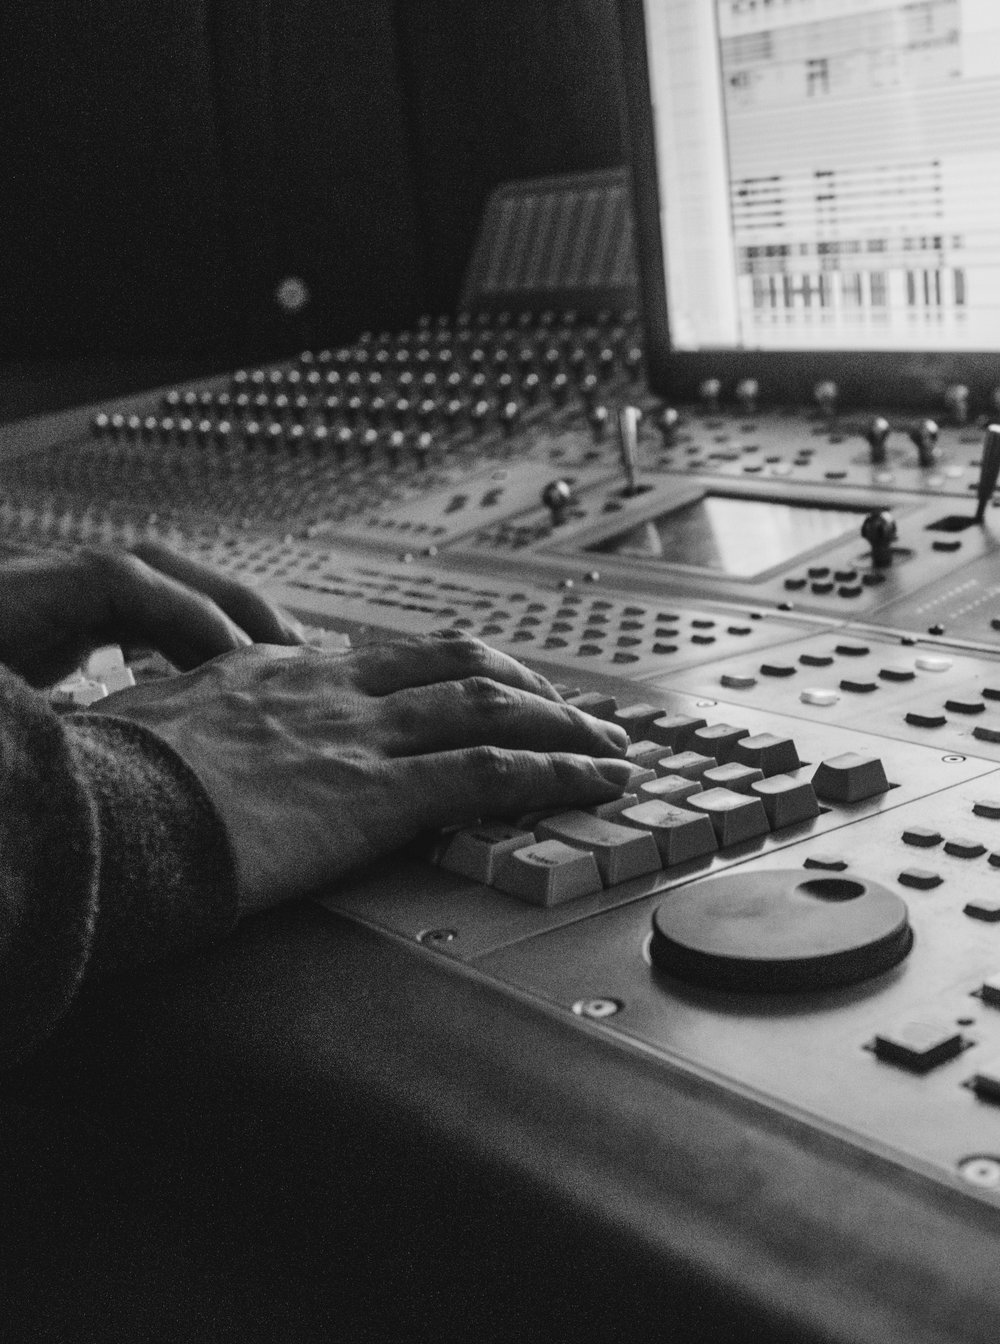 mixingdesk.JPG